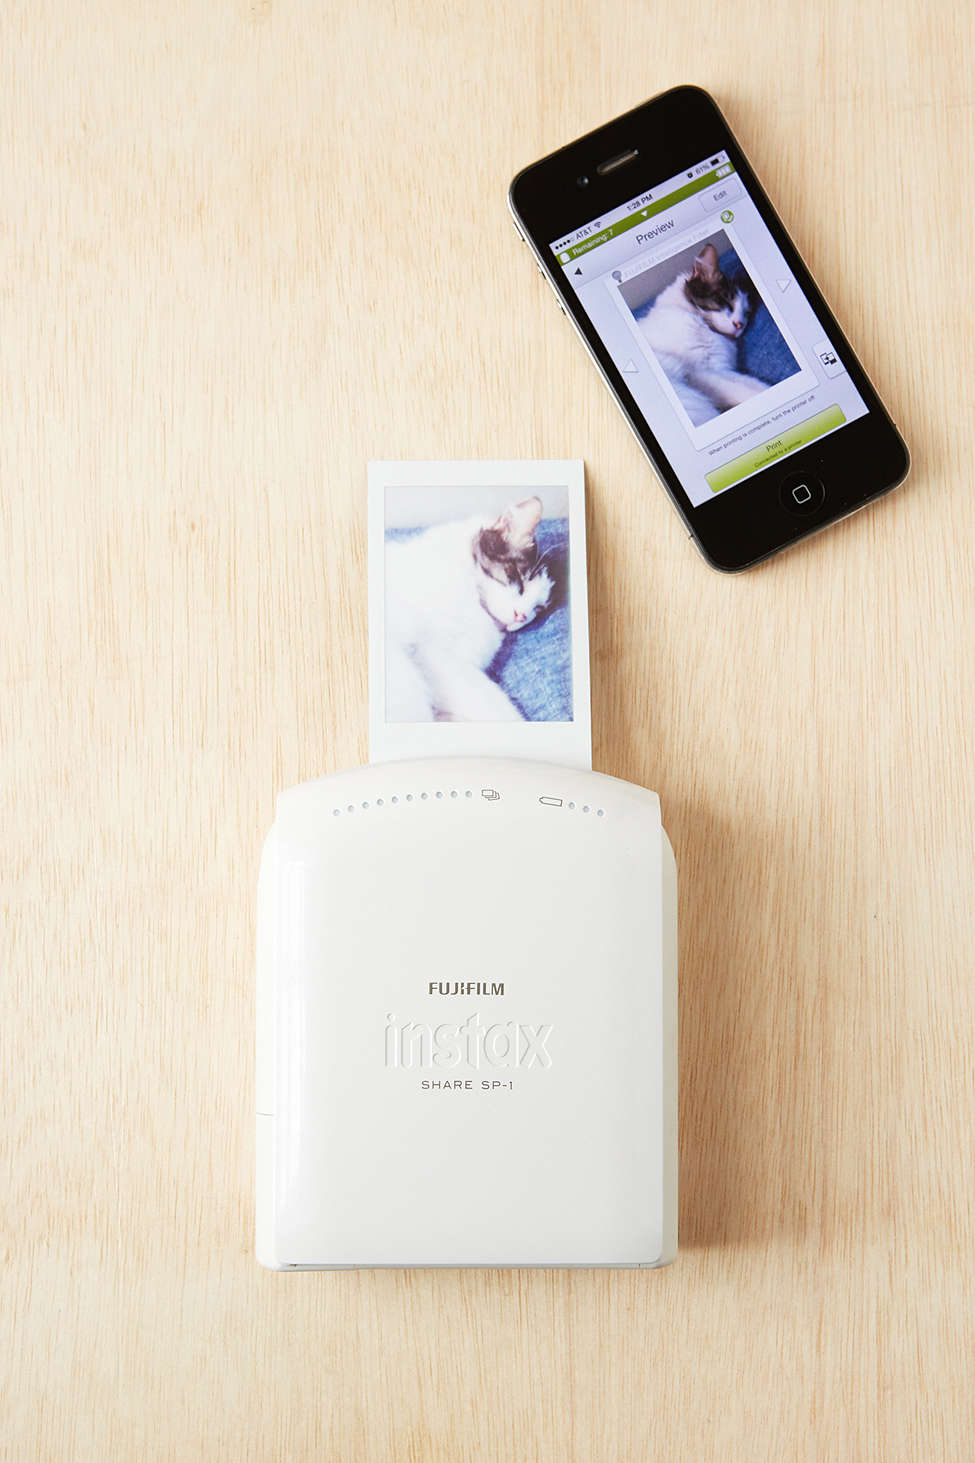 Fujifilm-Instax-Instant-Smartphone-Printer